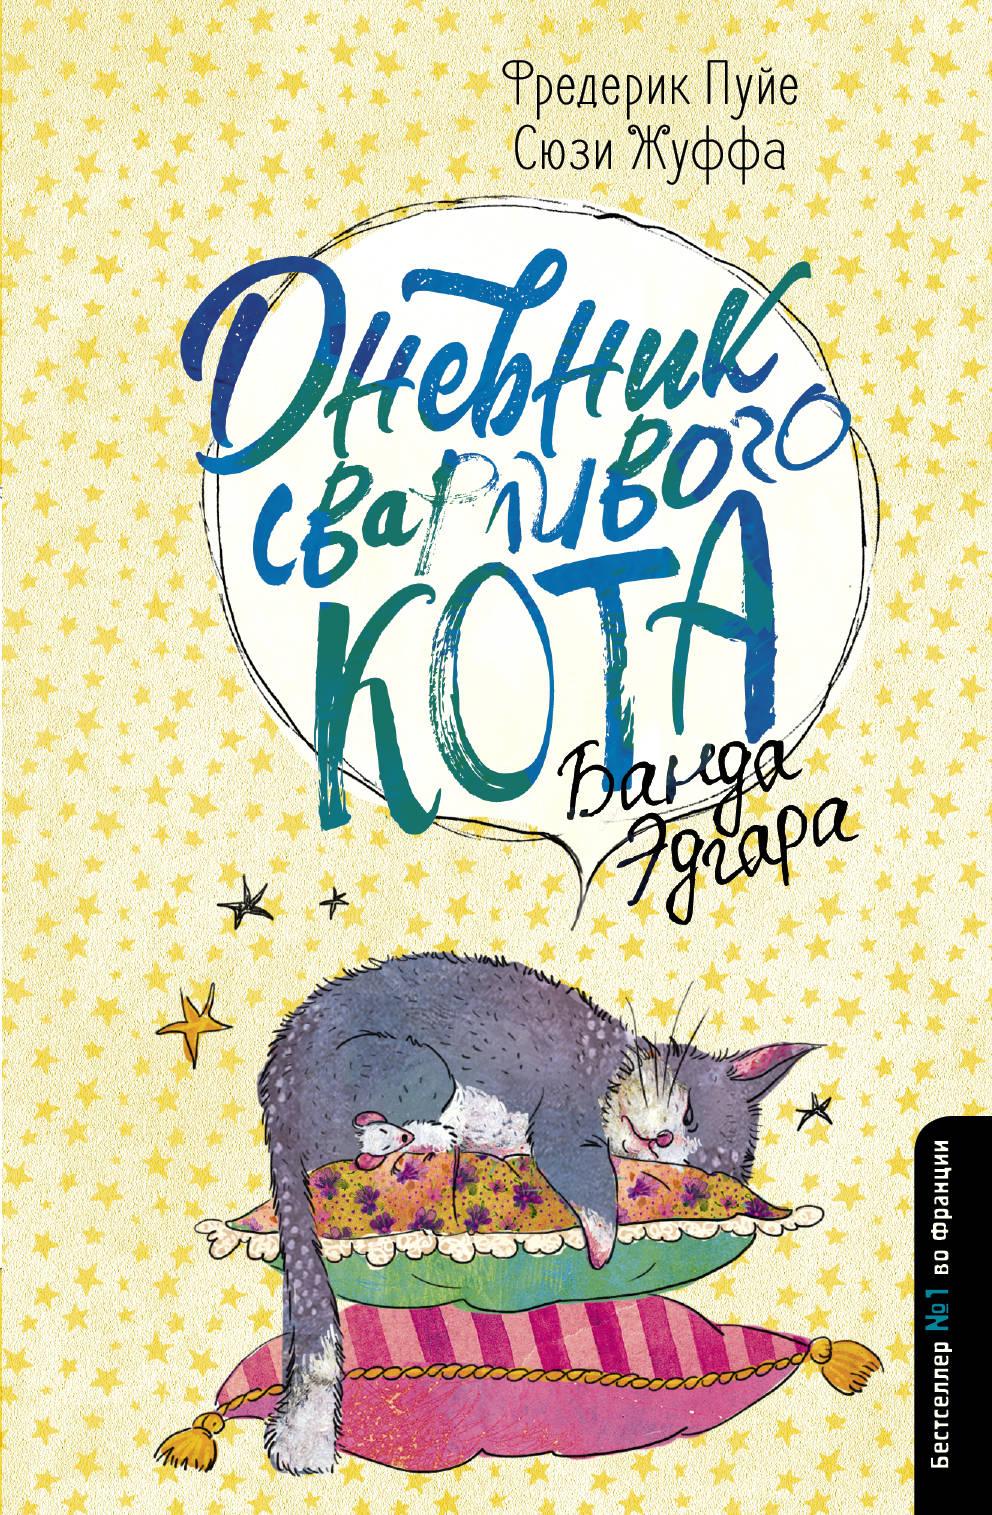 Дневник сварливого кота: Банда Эдгара